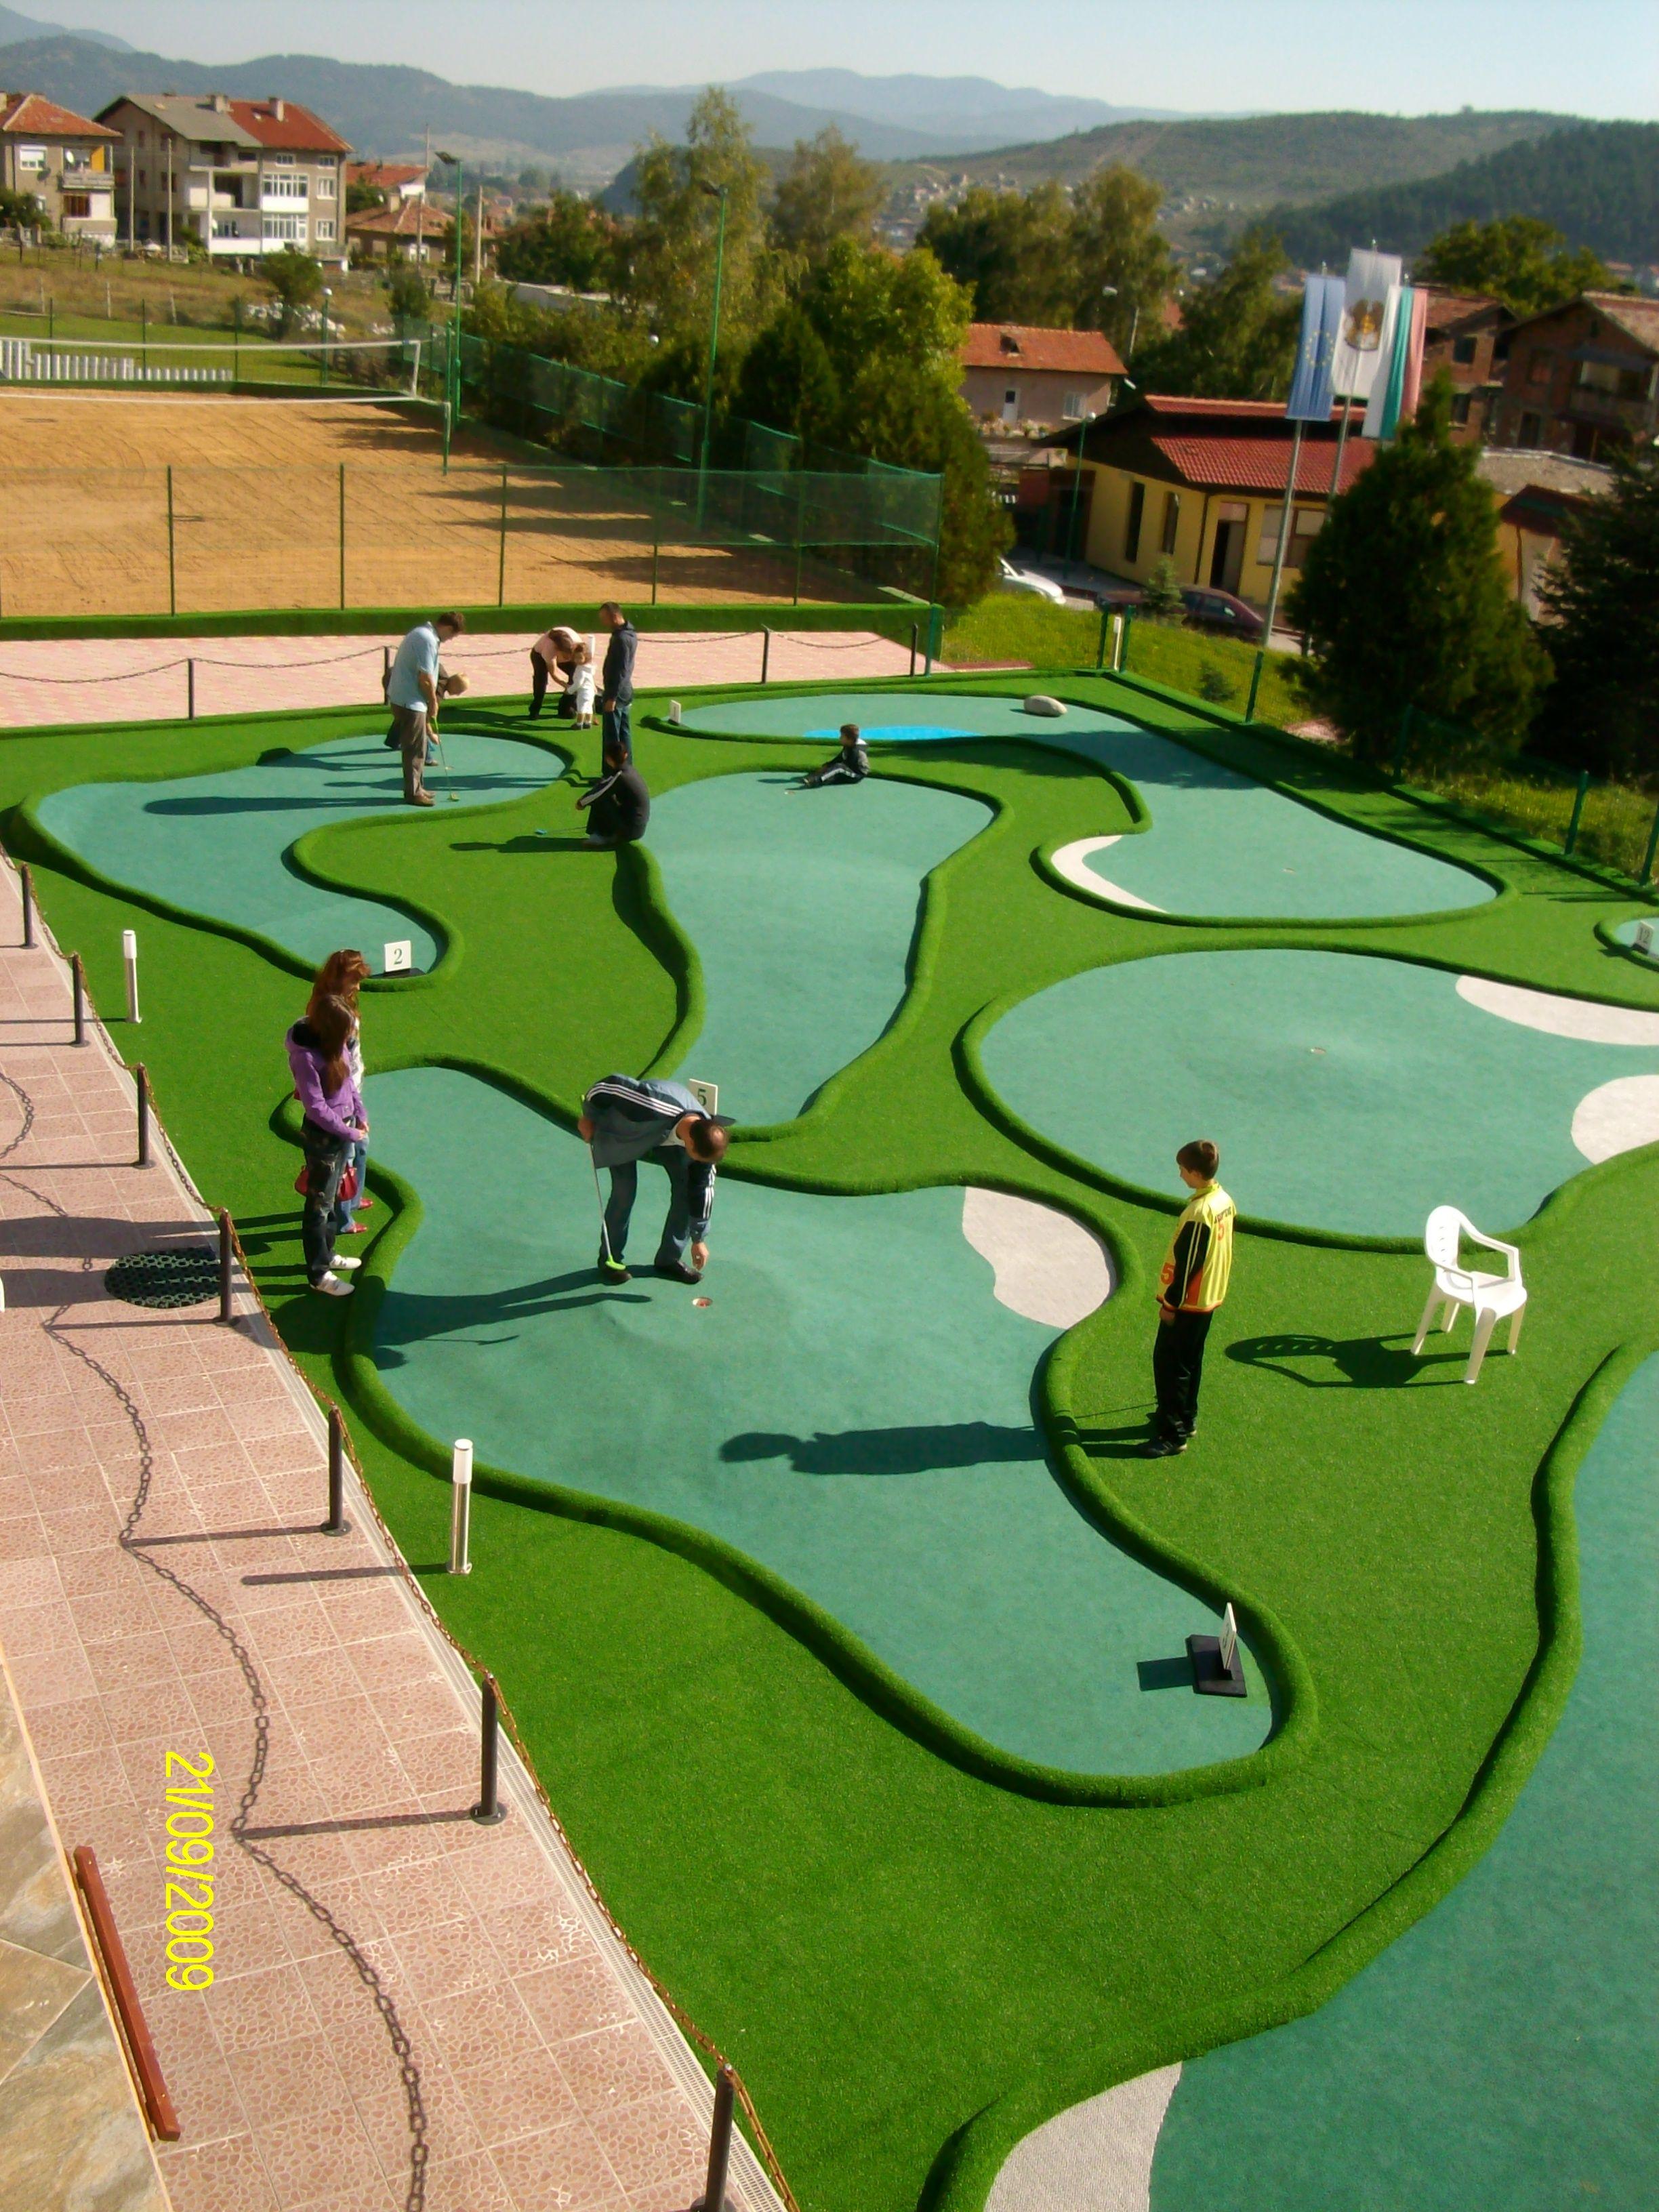 A Course We Have Build Or Made Mini Golf Course Miniature Golf Course Hotel Landscape Mini backyard golf course